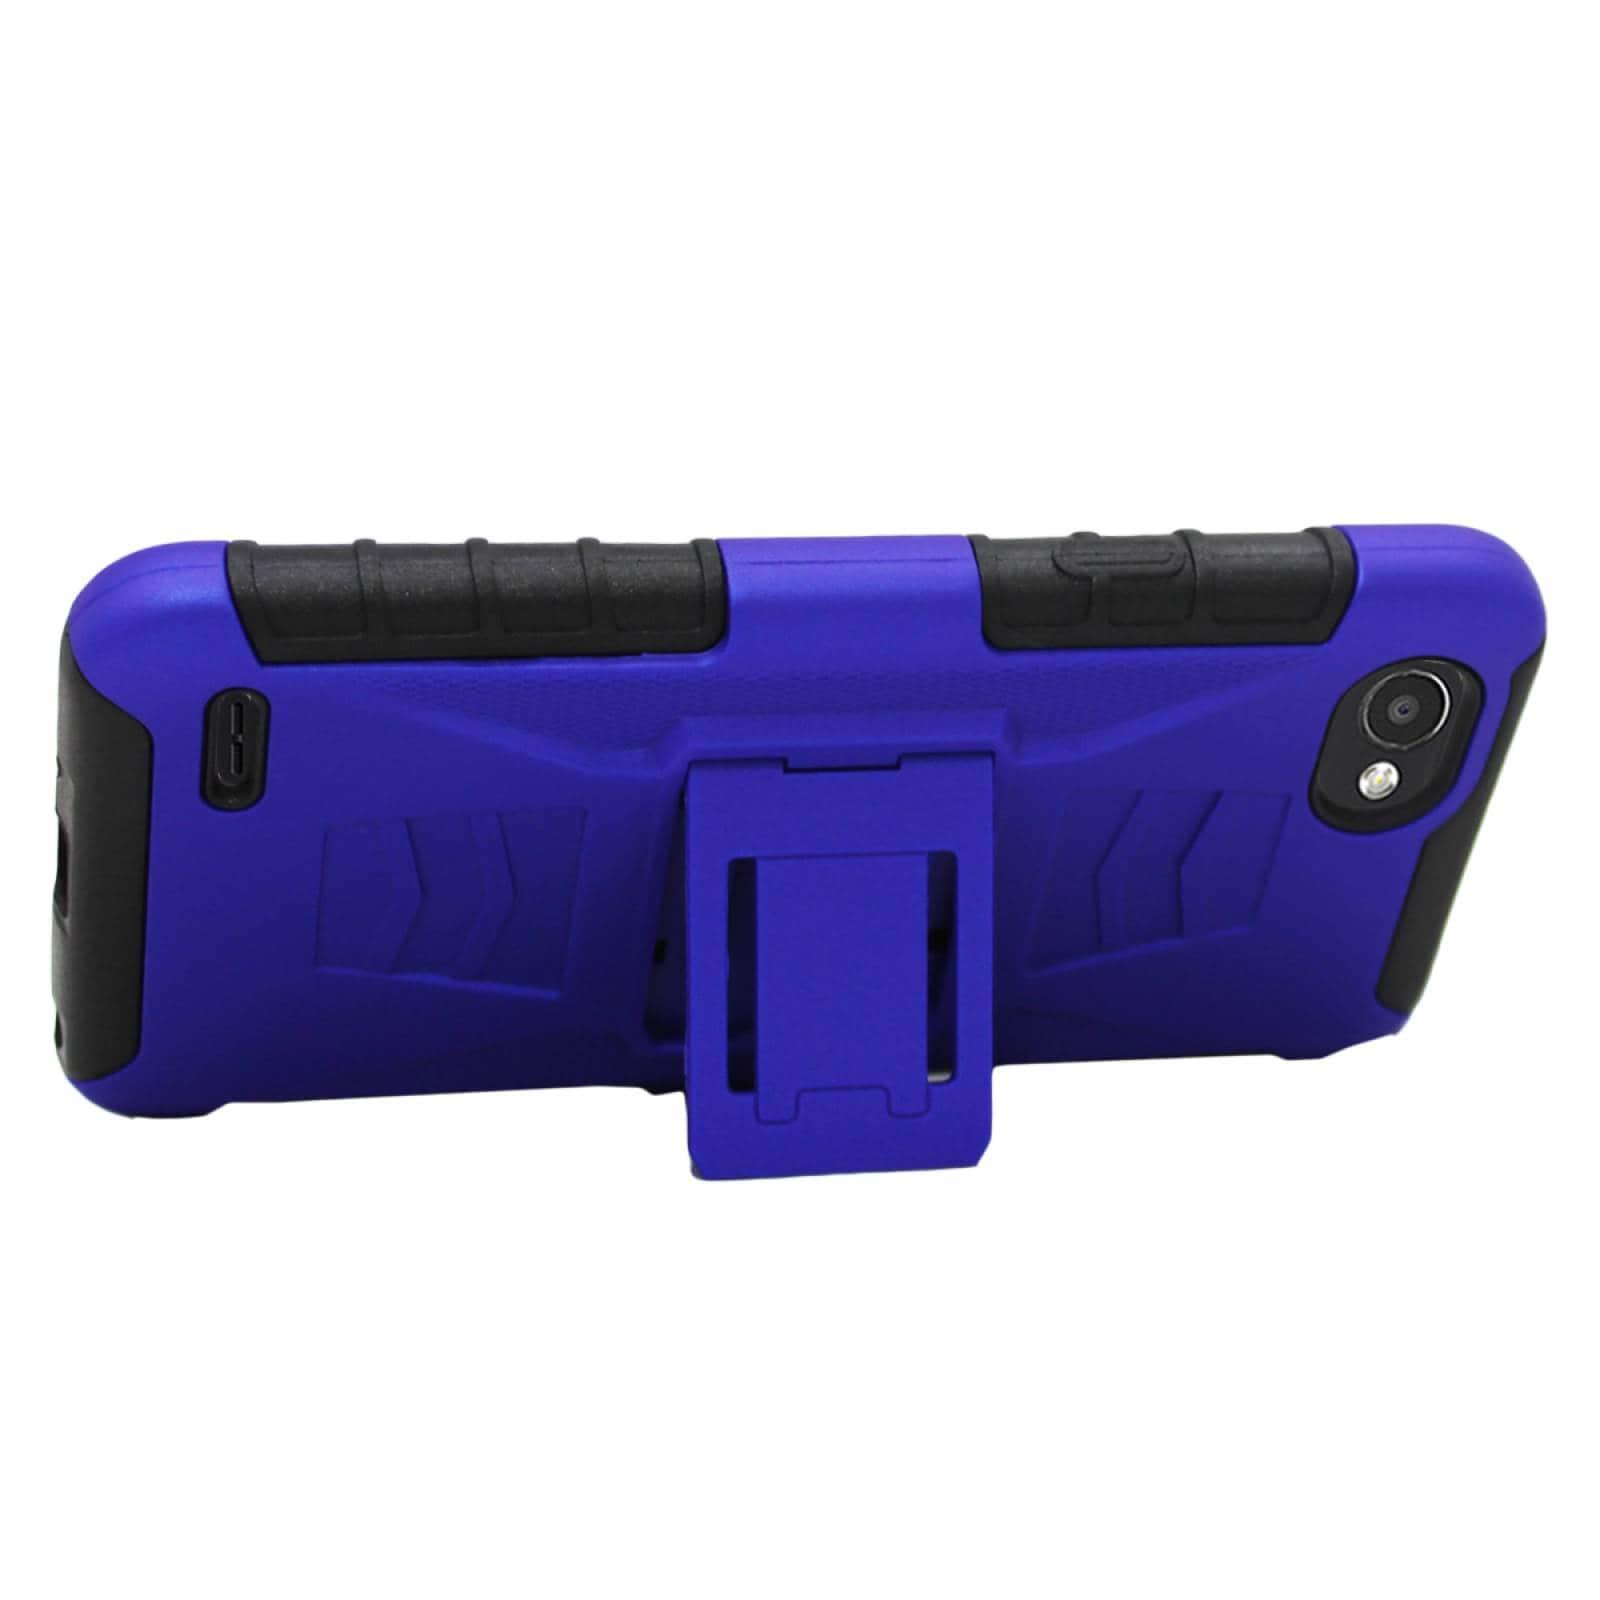 Funda 3 en 1 LG Q6 Prime M700H Clip Case Uso Rudo Iron Bear